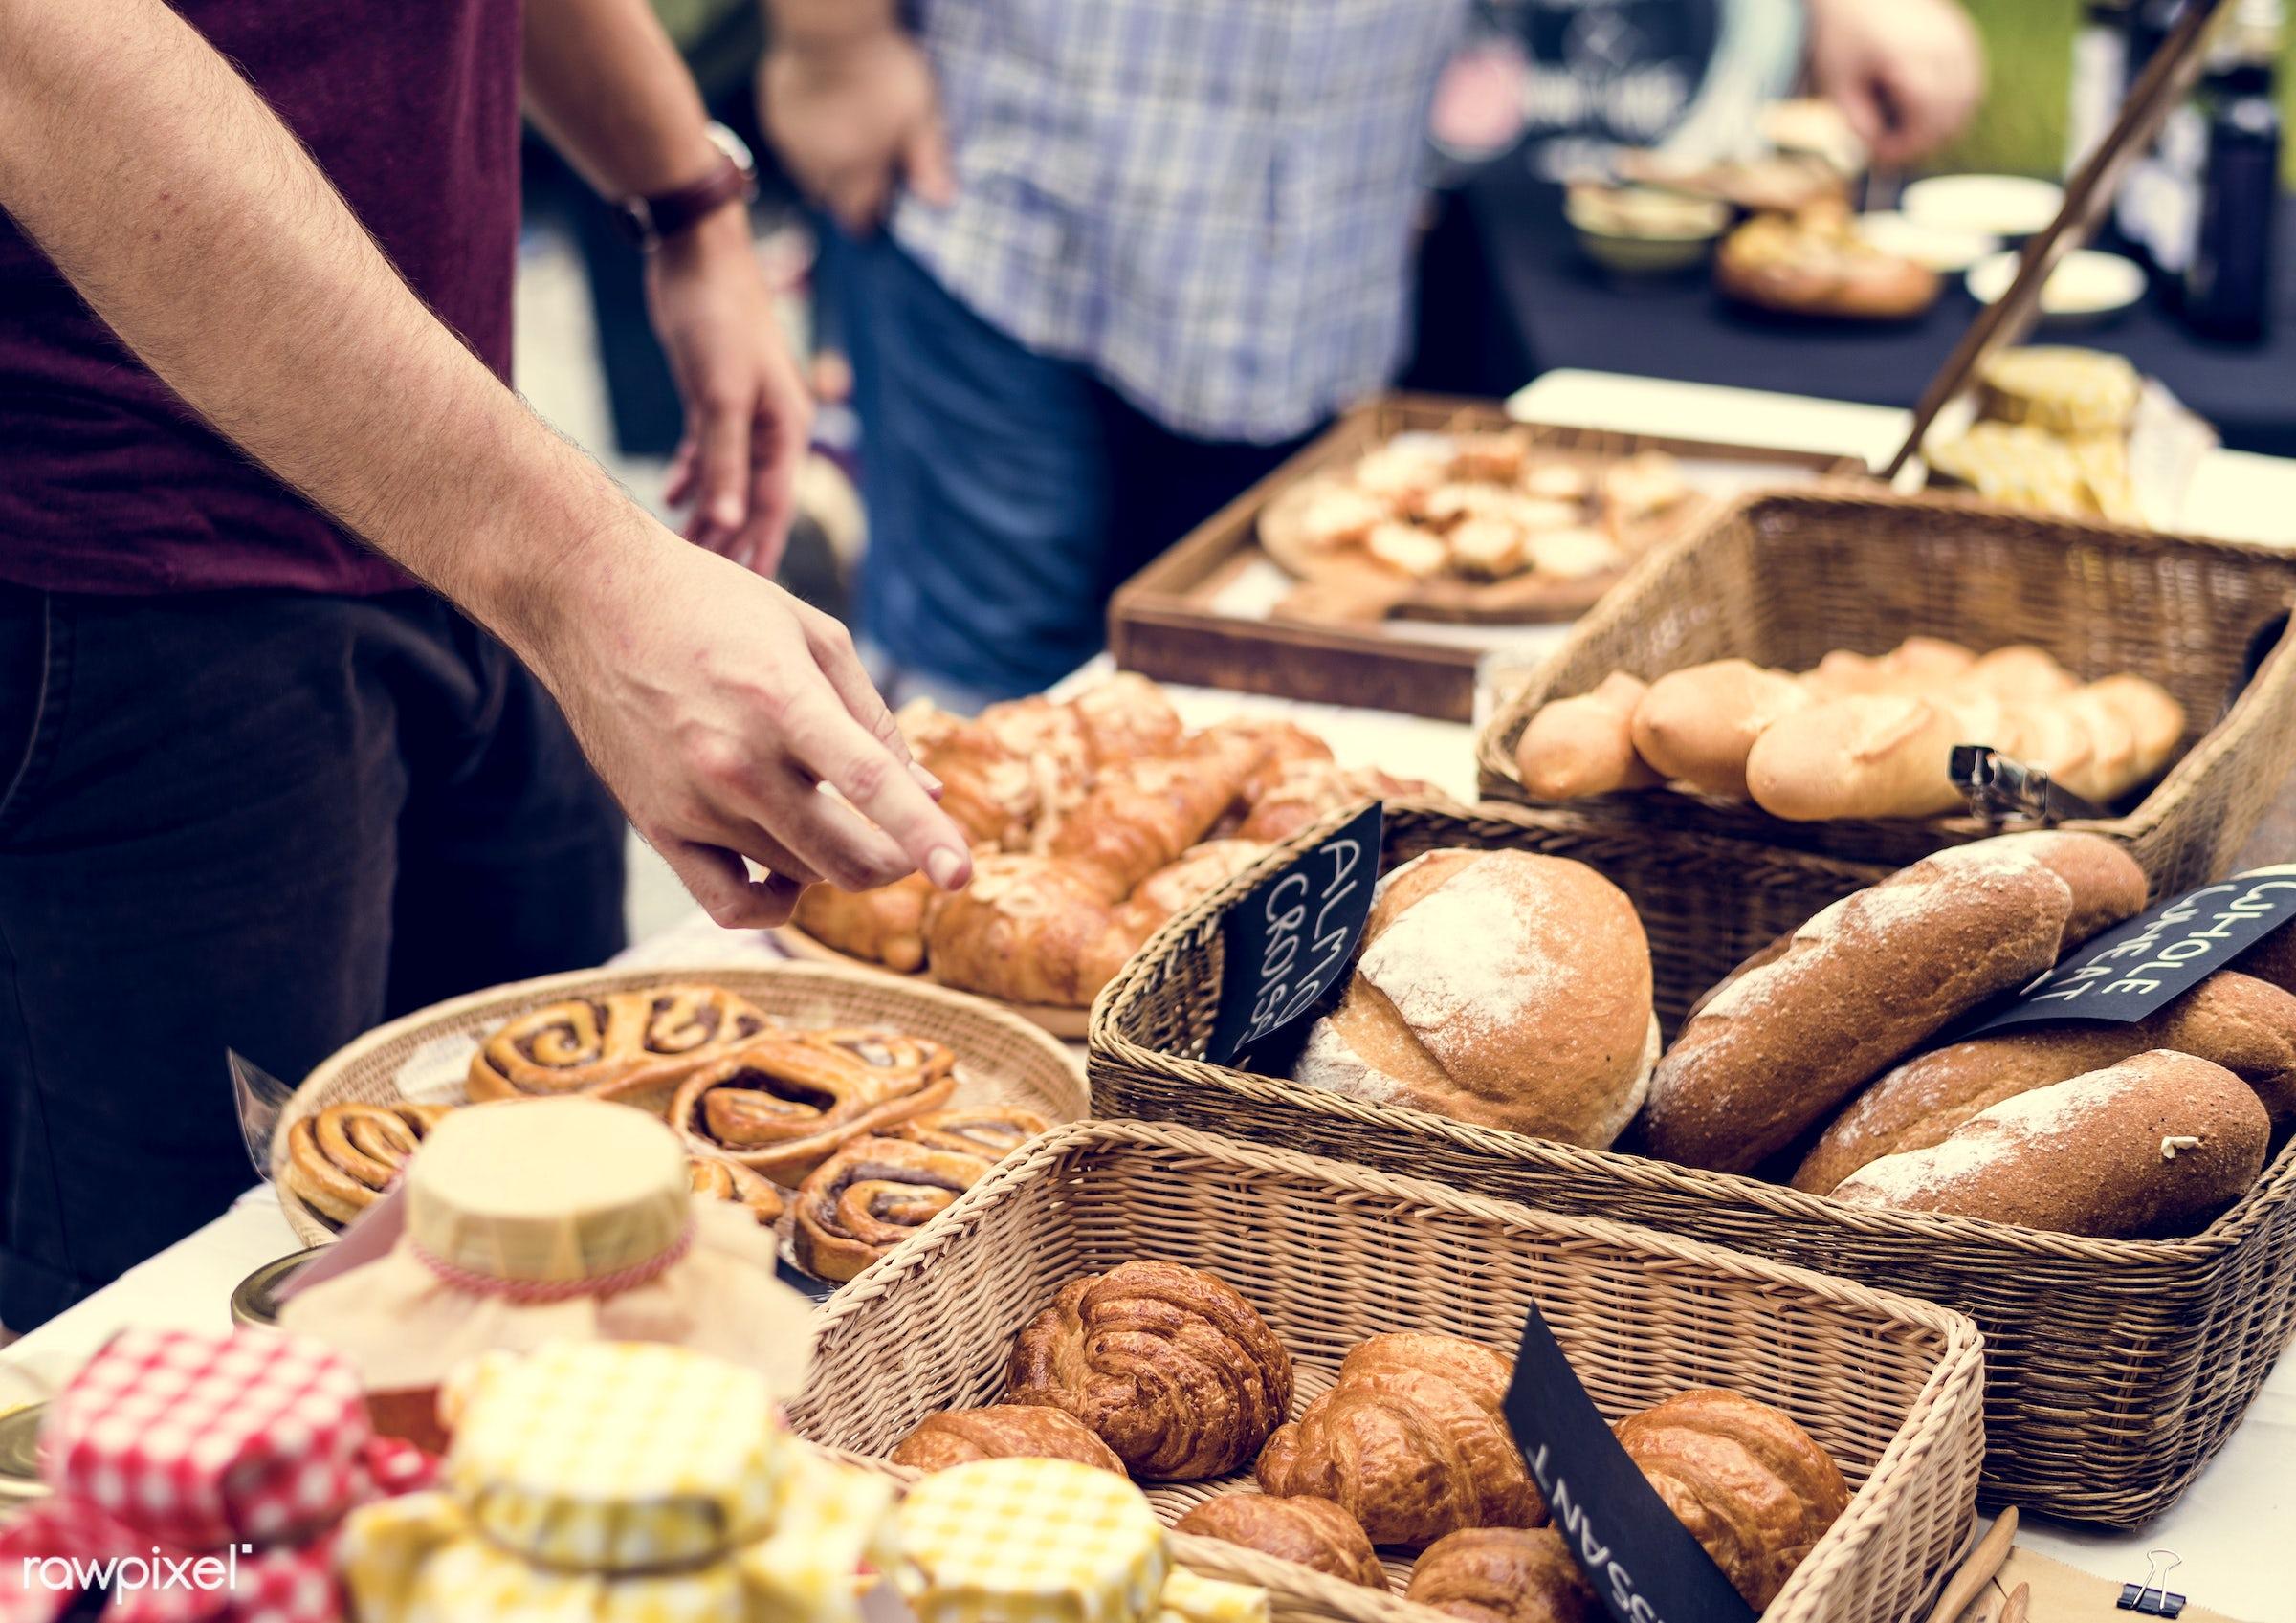 grocery, shop, cutout, cuisine, pastries, stall, bake, goods, homemade, baked, taste, bakery, fresh, bread, various,...